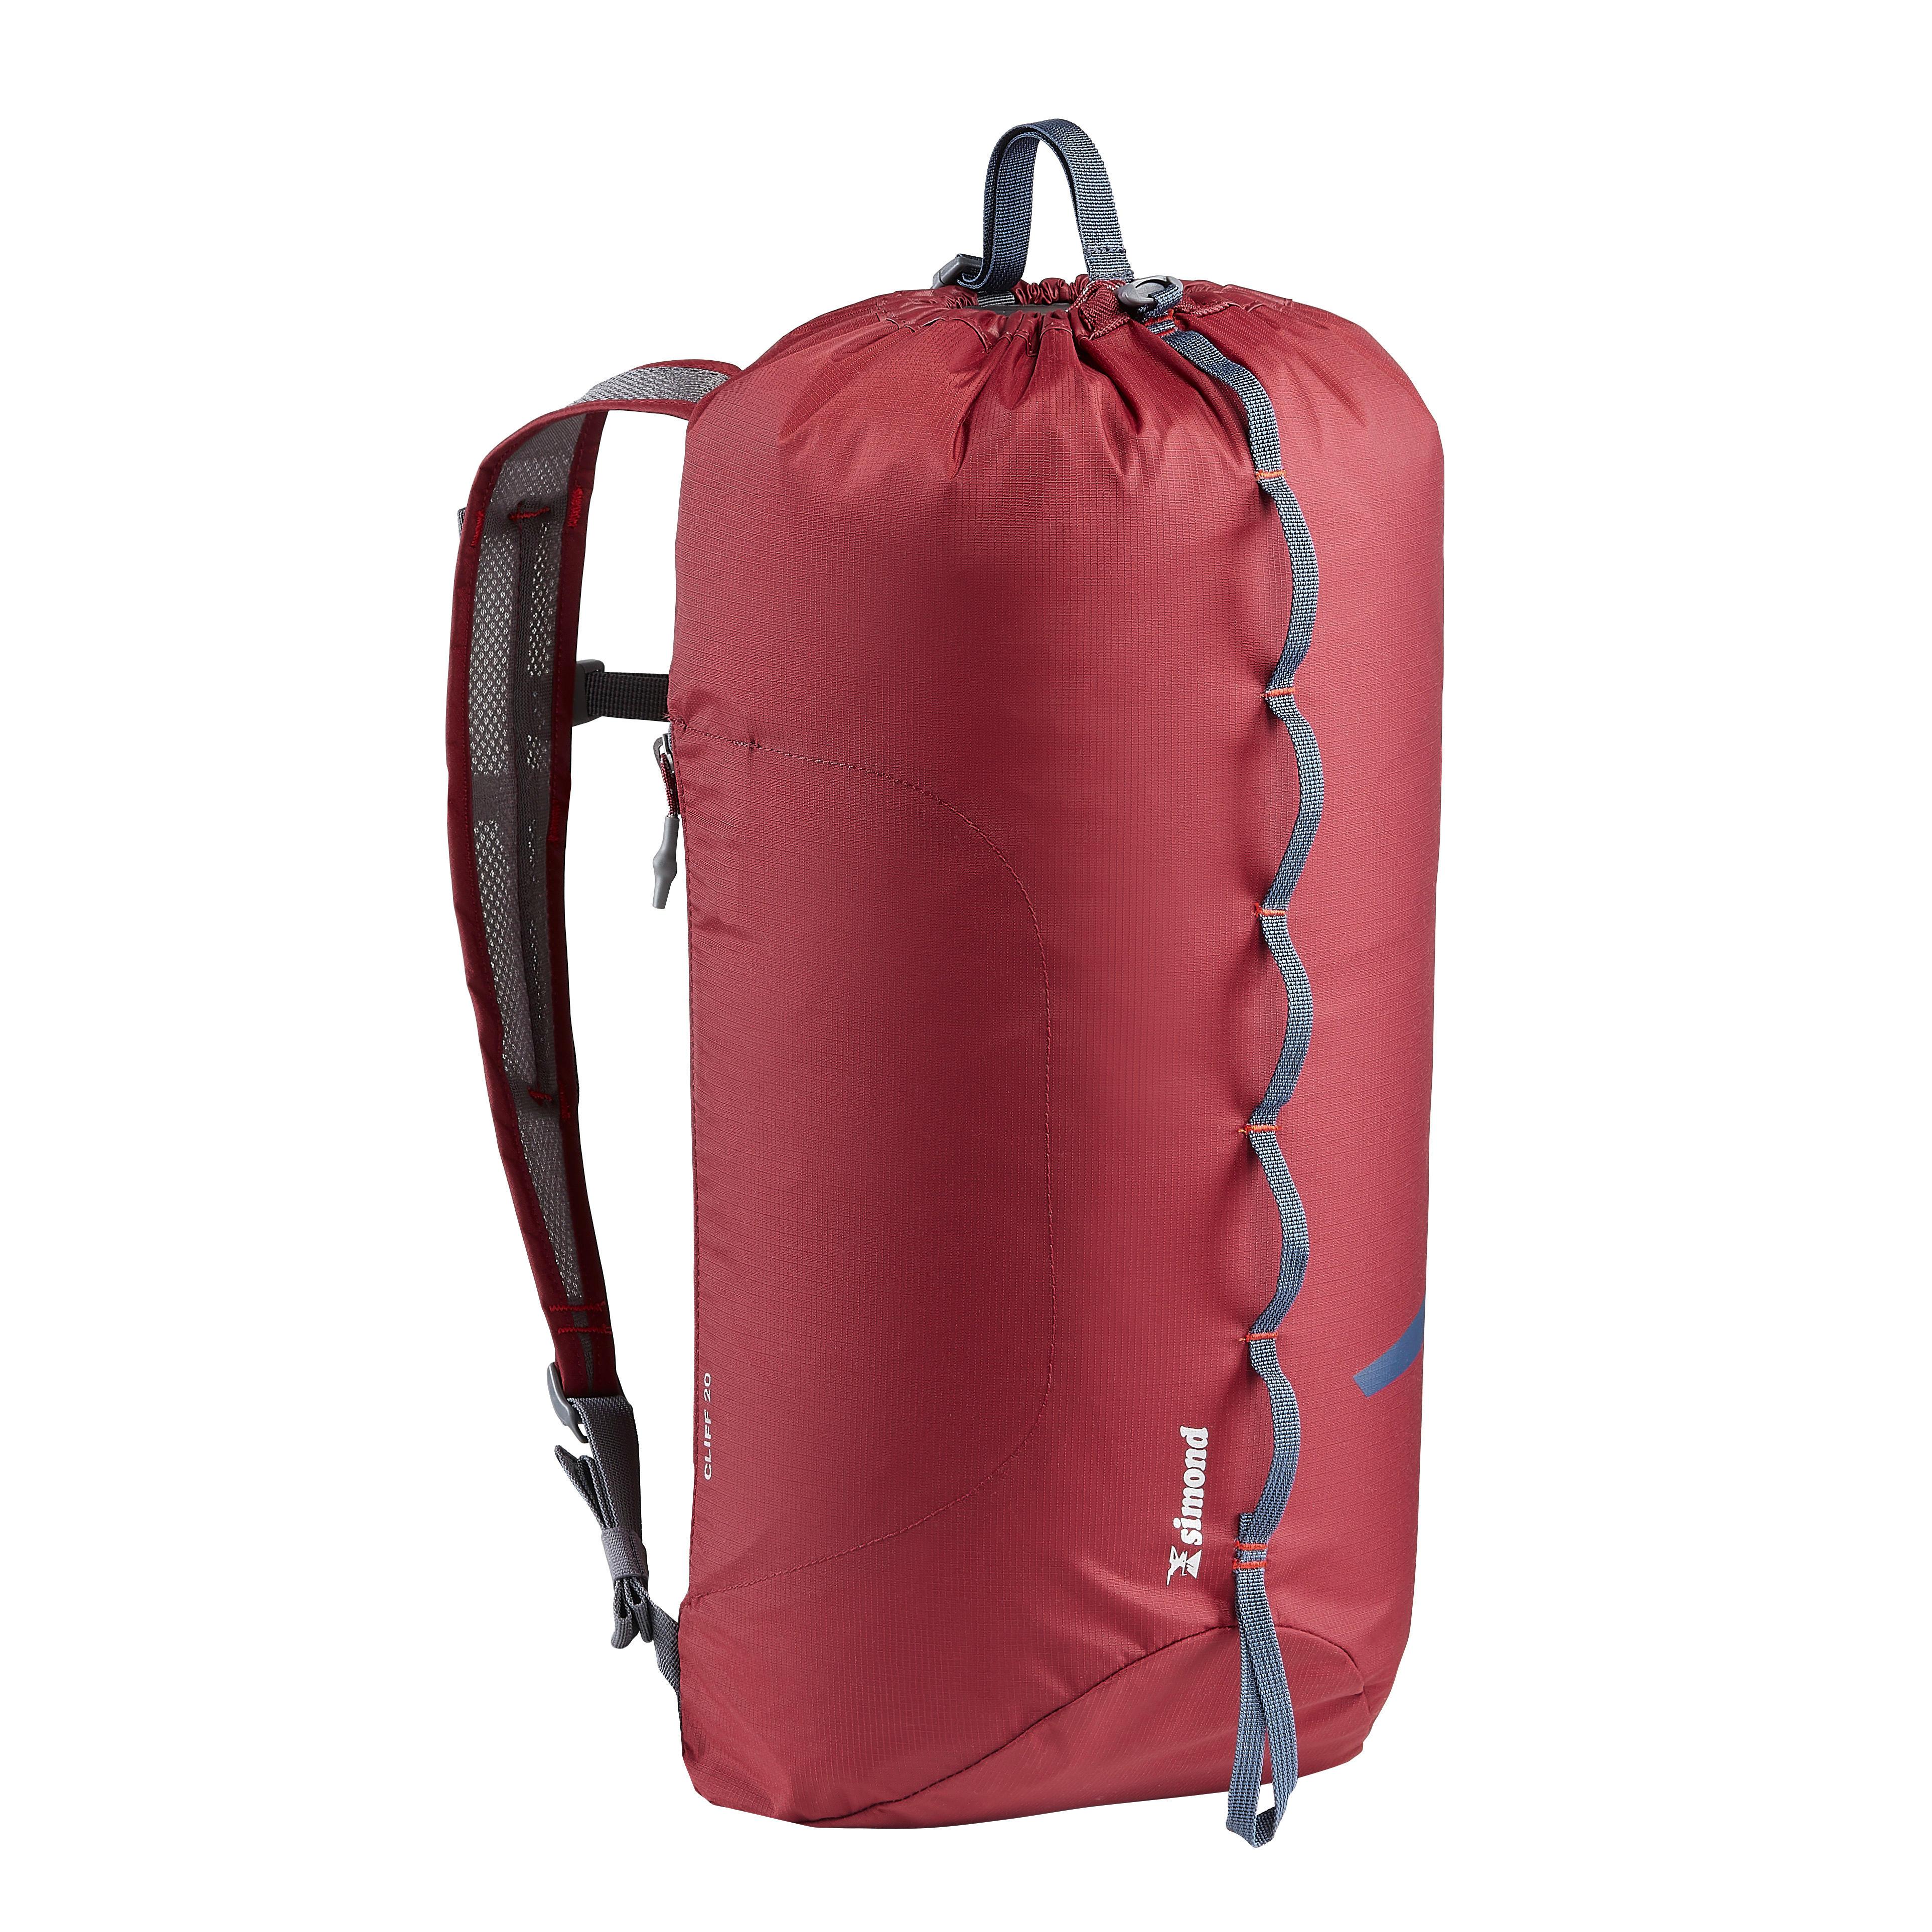 Sac à Dos Pour Corde D/'escalade Boucle Réglable Sac Pliable Confortable Camping